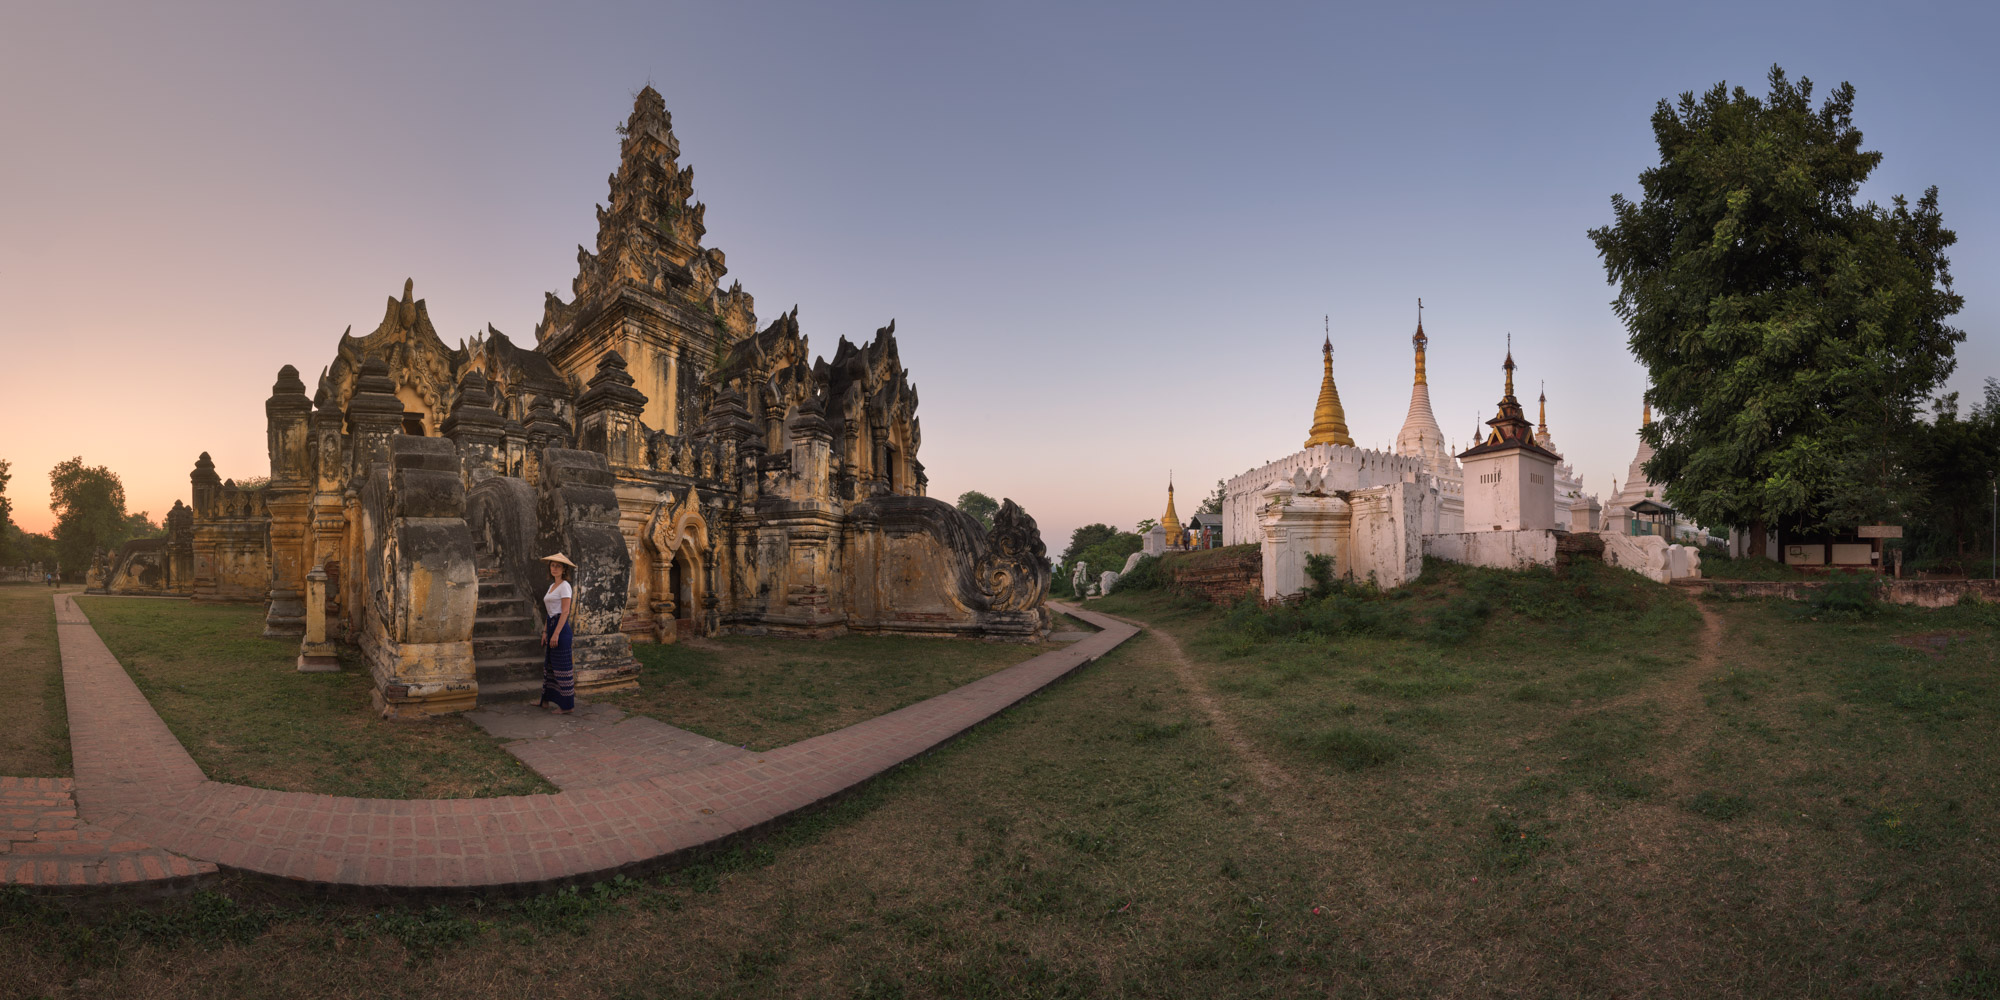 Maha Aungmye Bonzan Monastery, Inwa, Myanmar